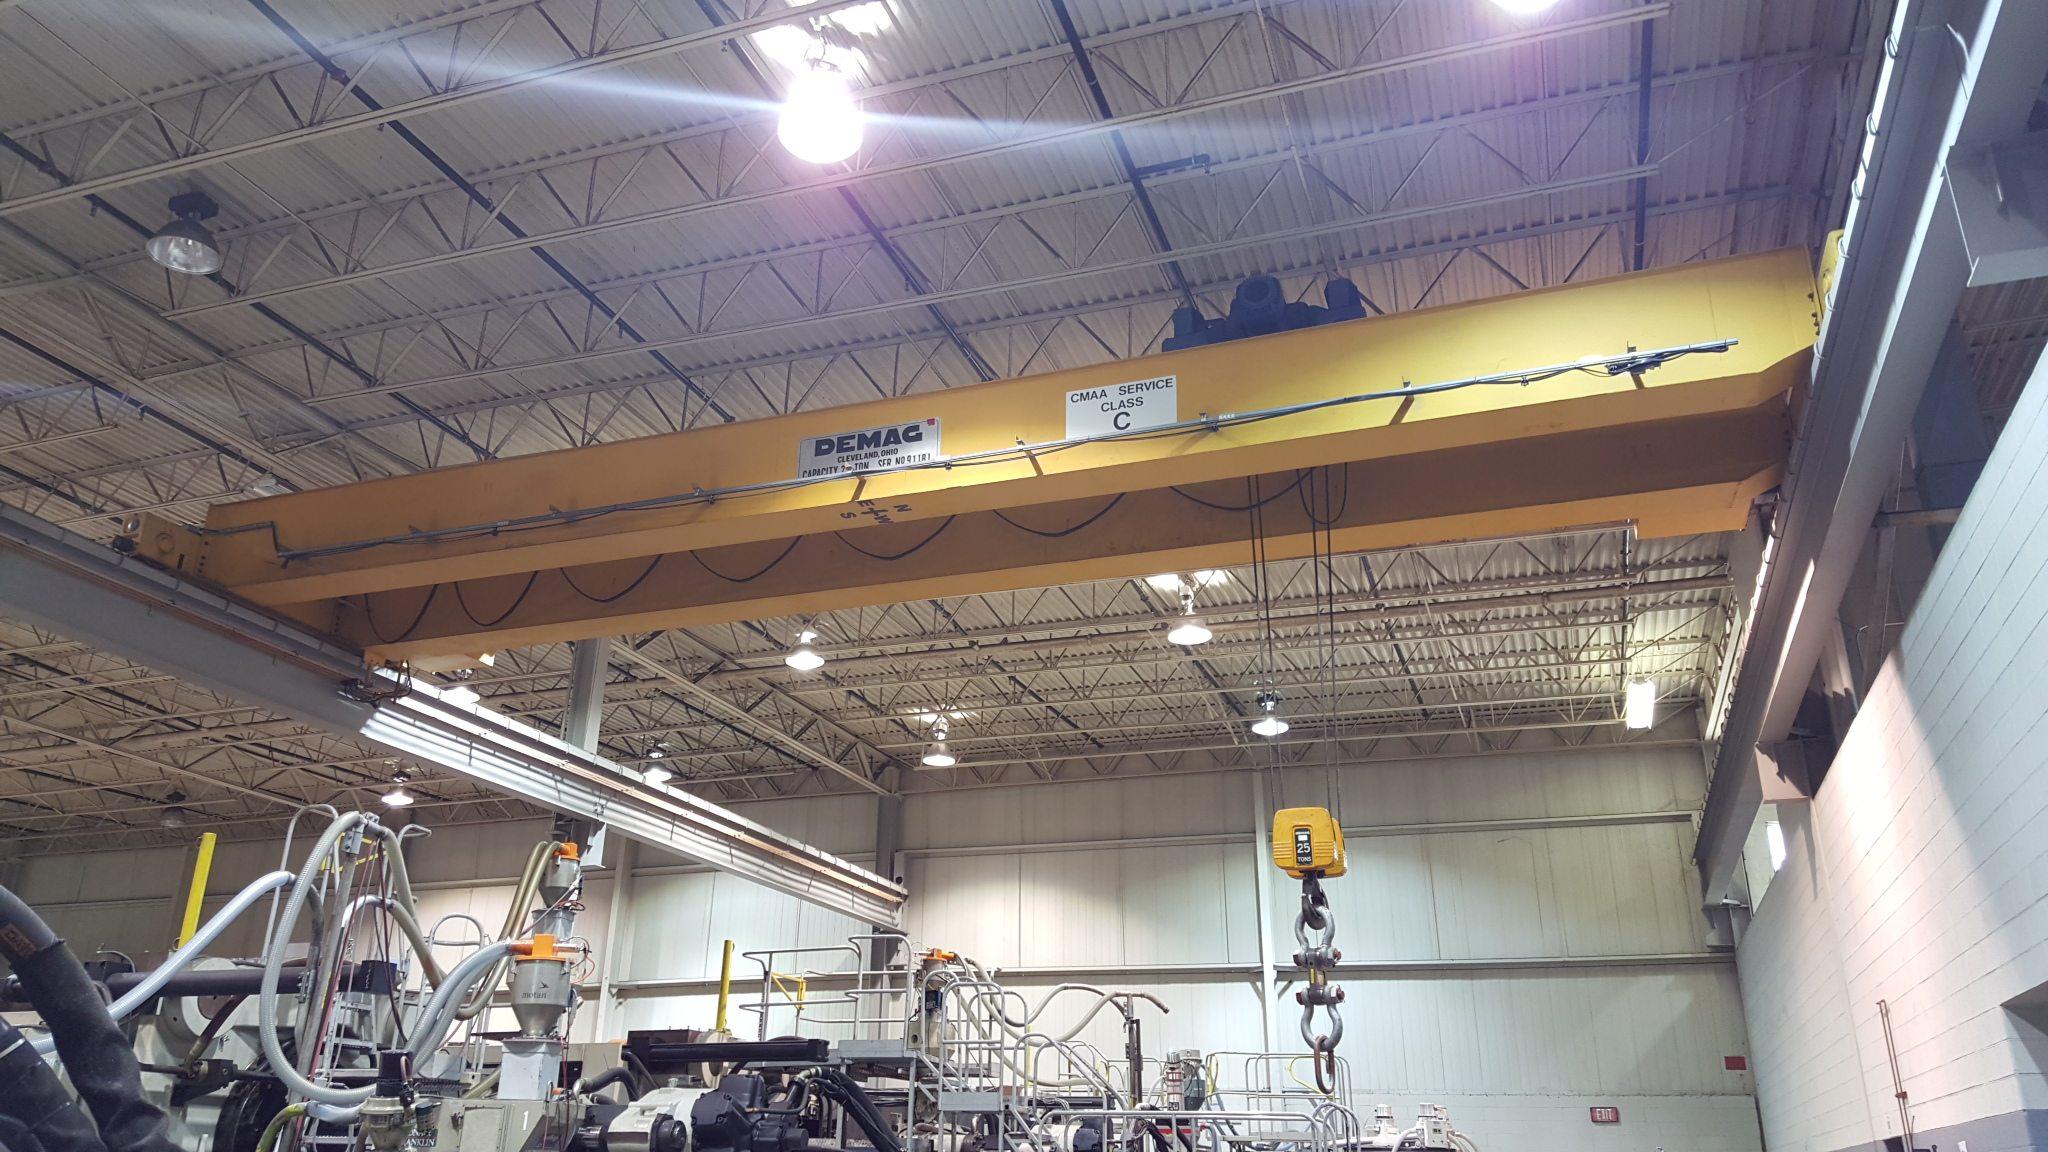 25 Ton Demag Overhead Bridge Crane For Sale